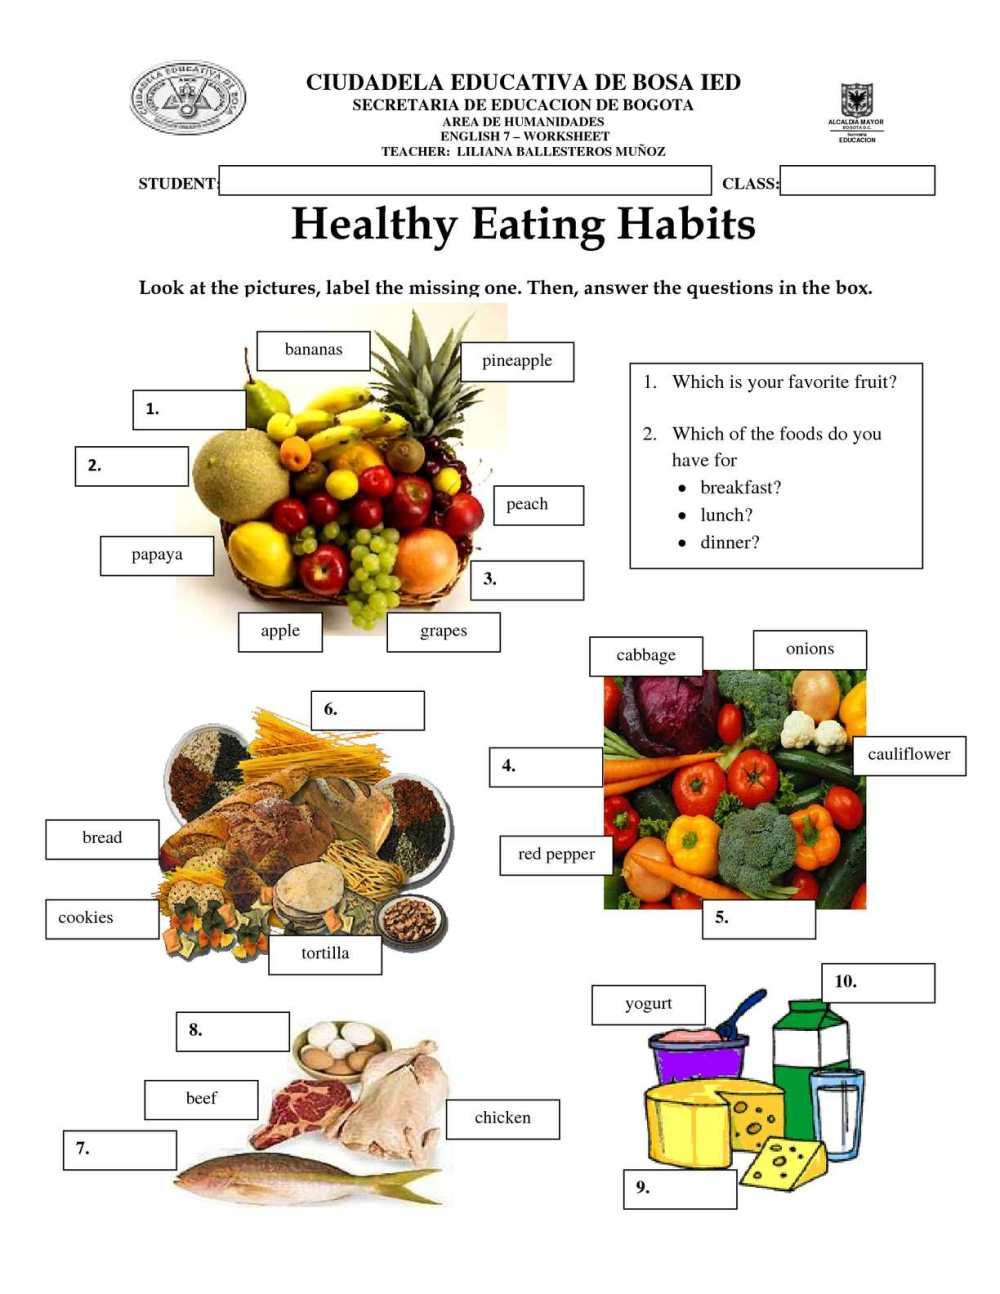 medium resolution of Calaméo - Worksheet Healthy Eating Habits